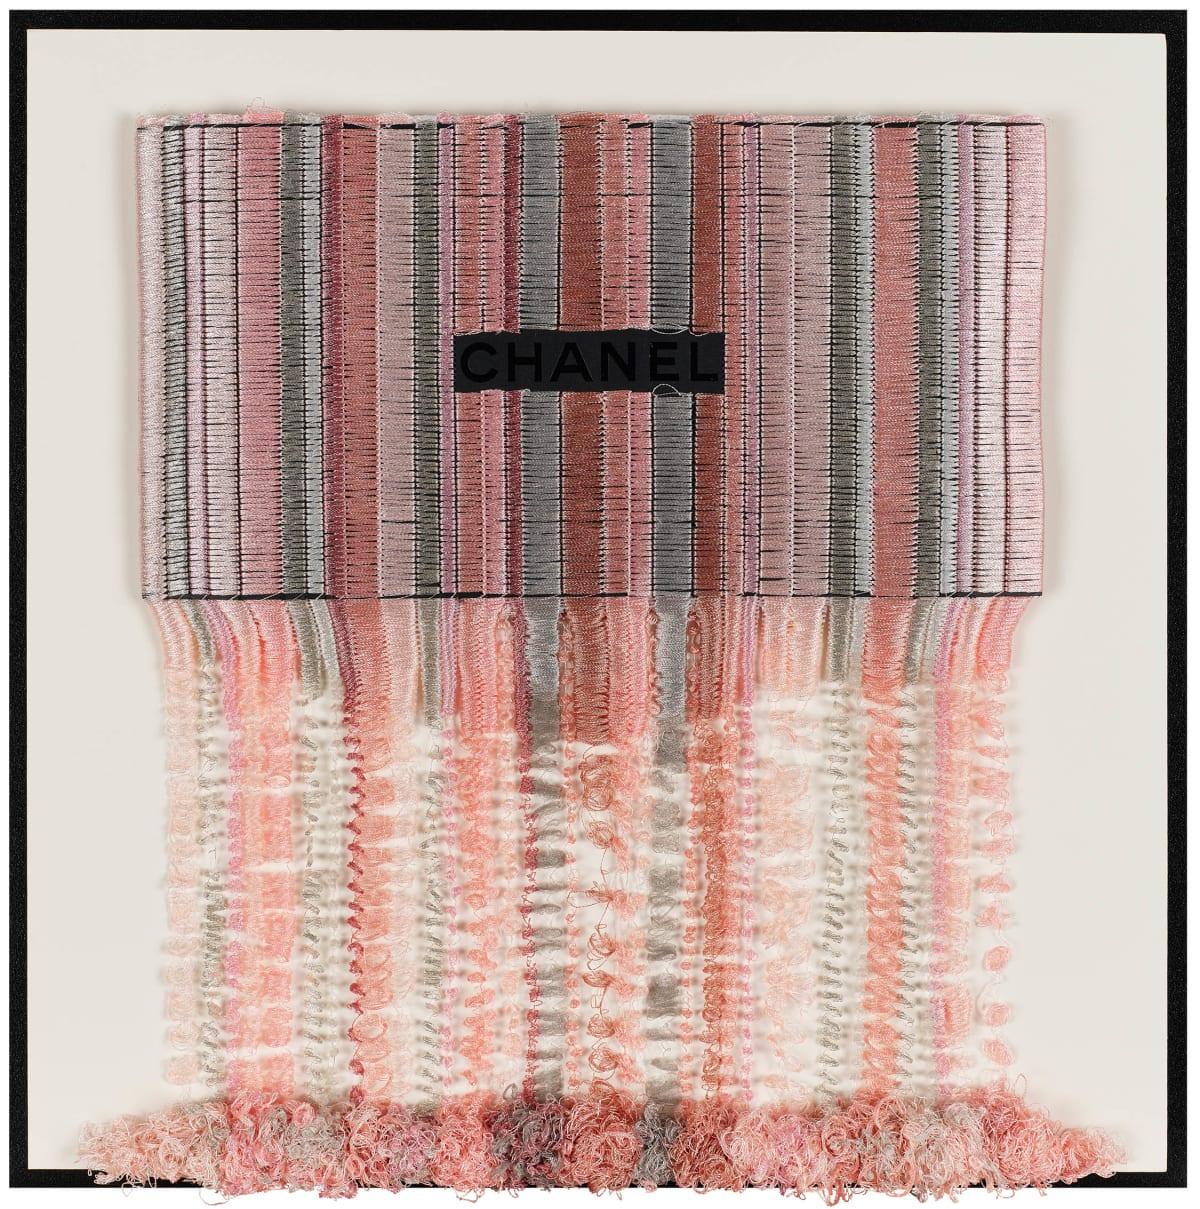 Stephen Wilson, Chanel Blush Drip III, 2019